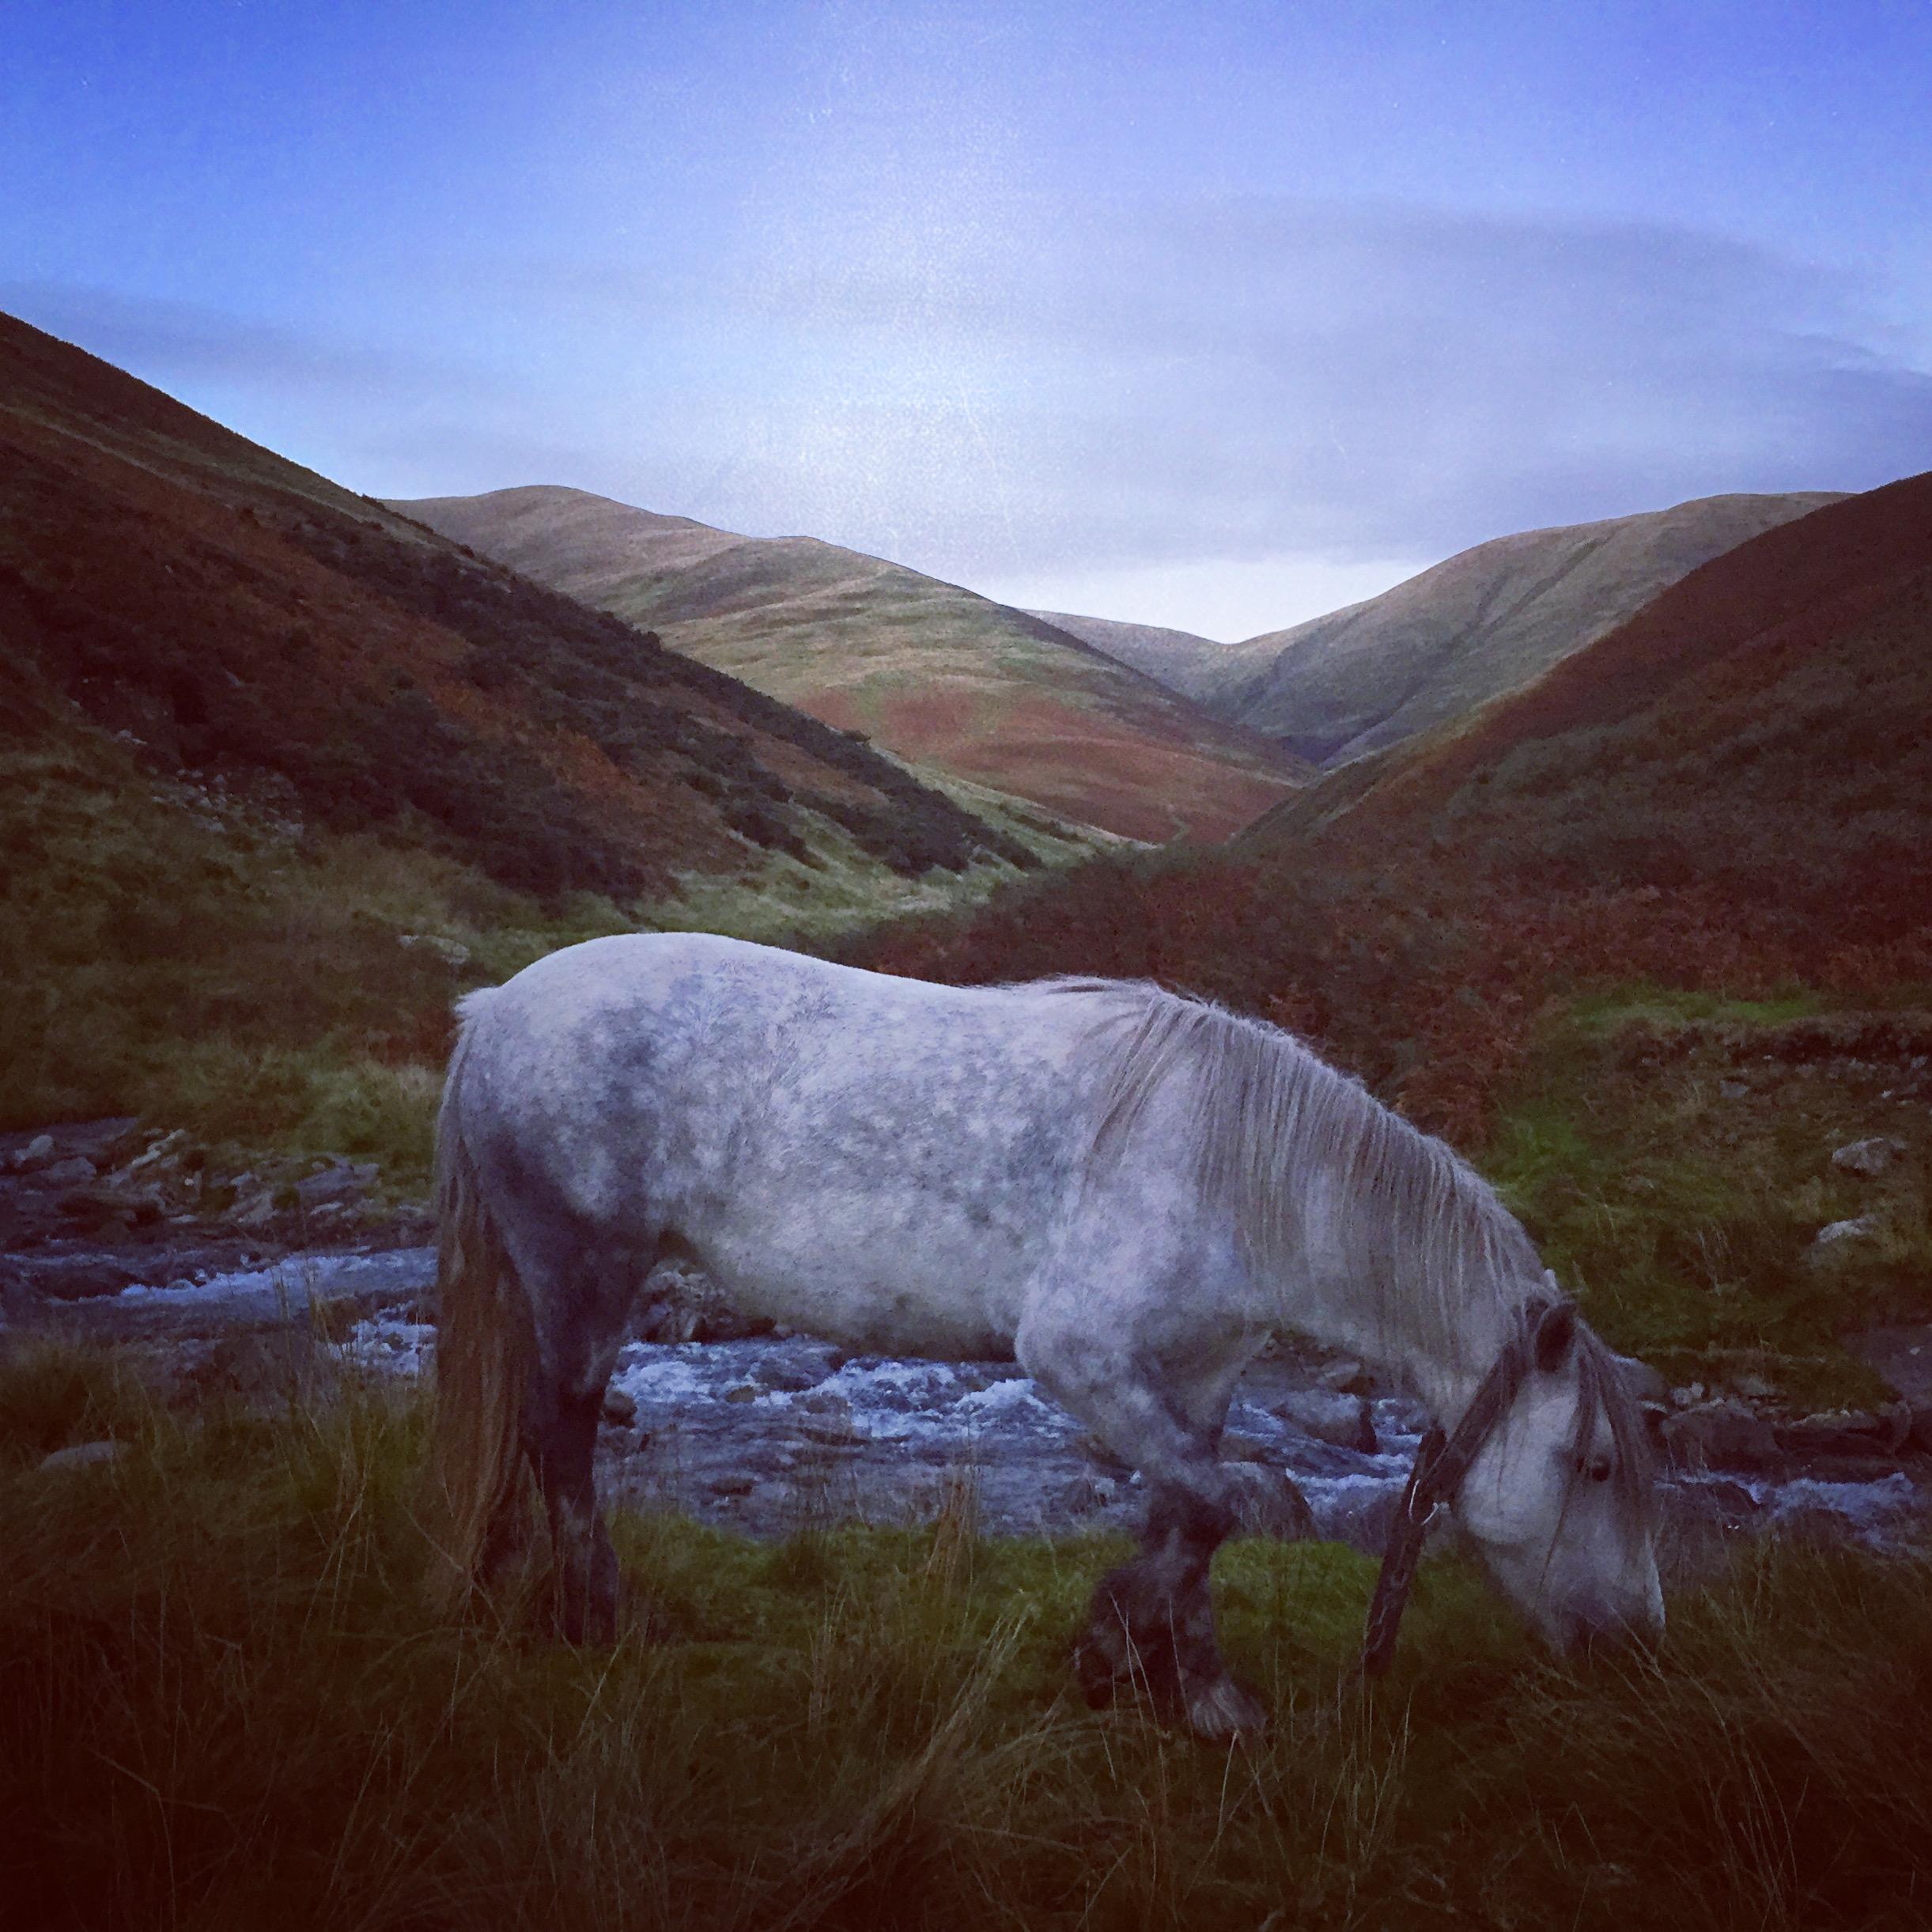 Hades Hill Fay at the foot of White Fell Head (photo Tom LLoyd)